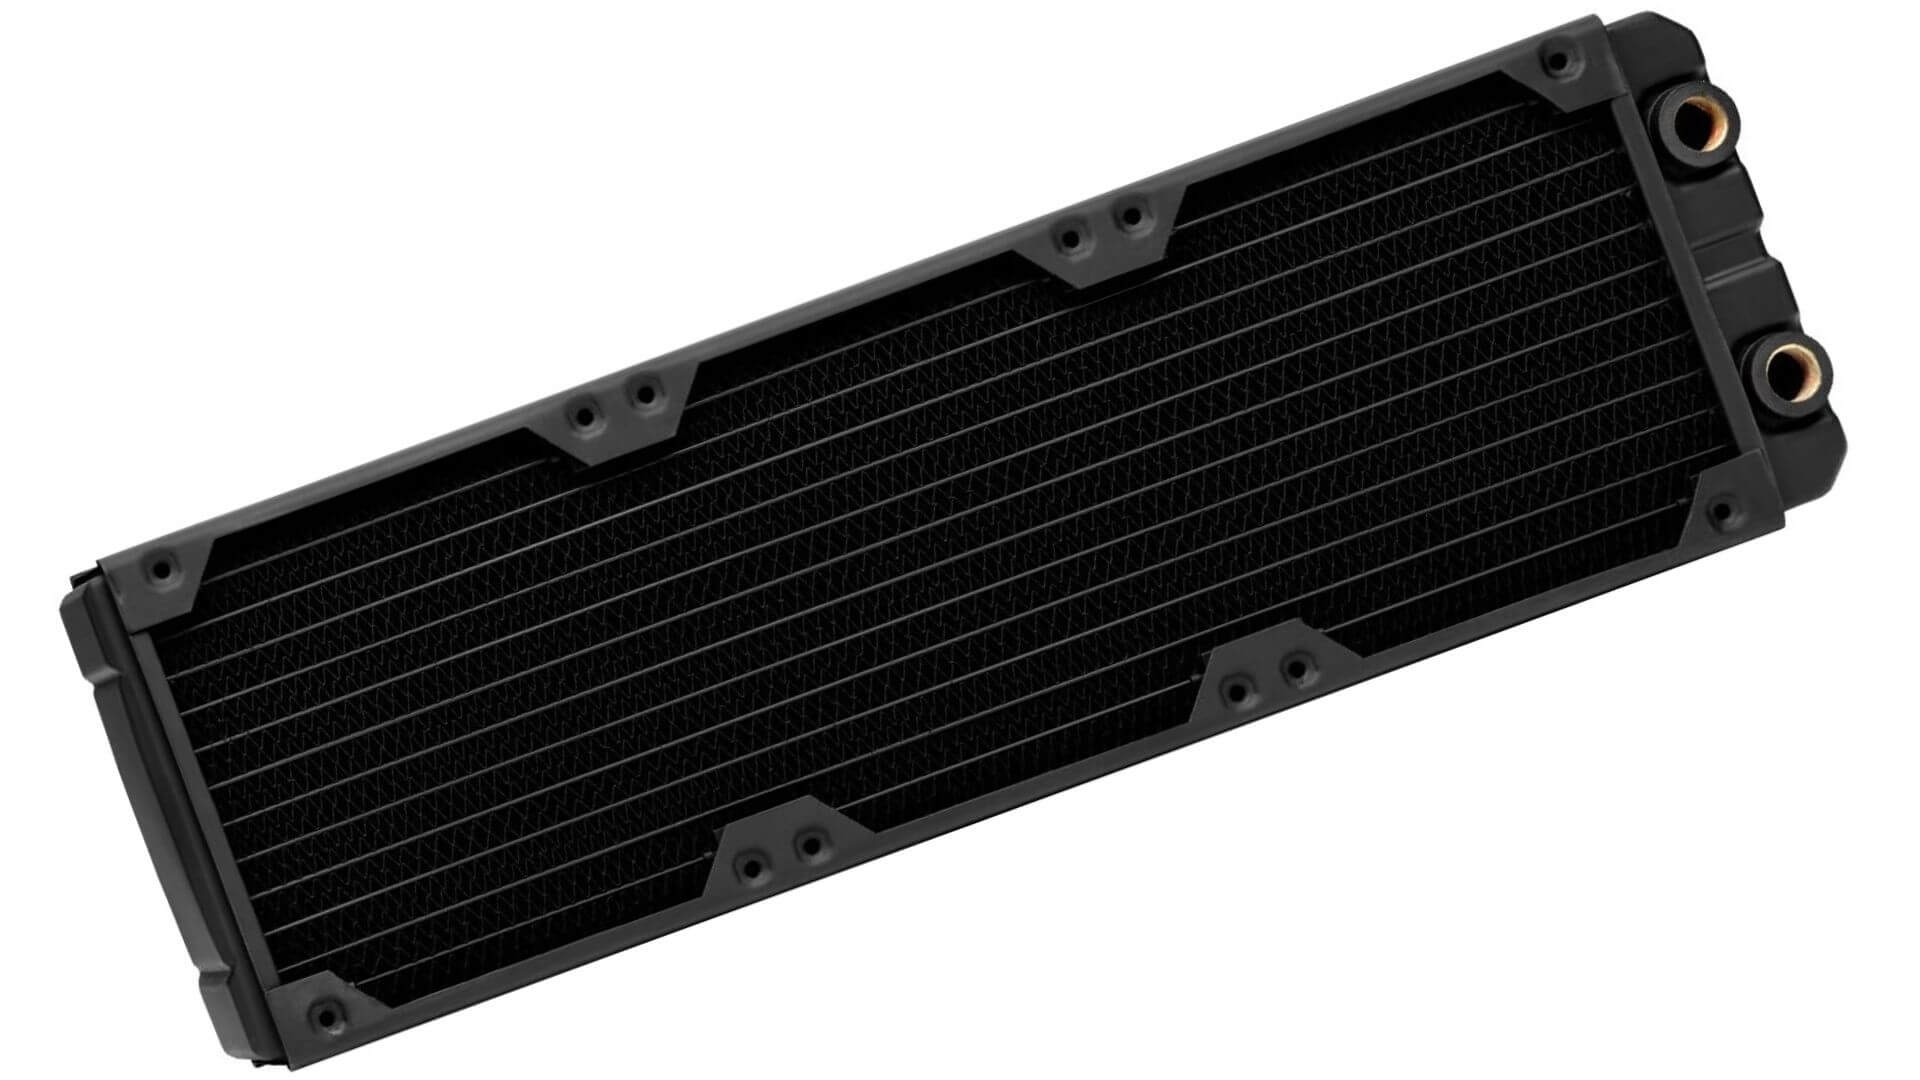 Corsair Hydro Water Cooling Radiator